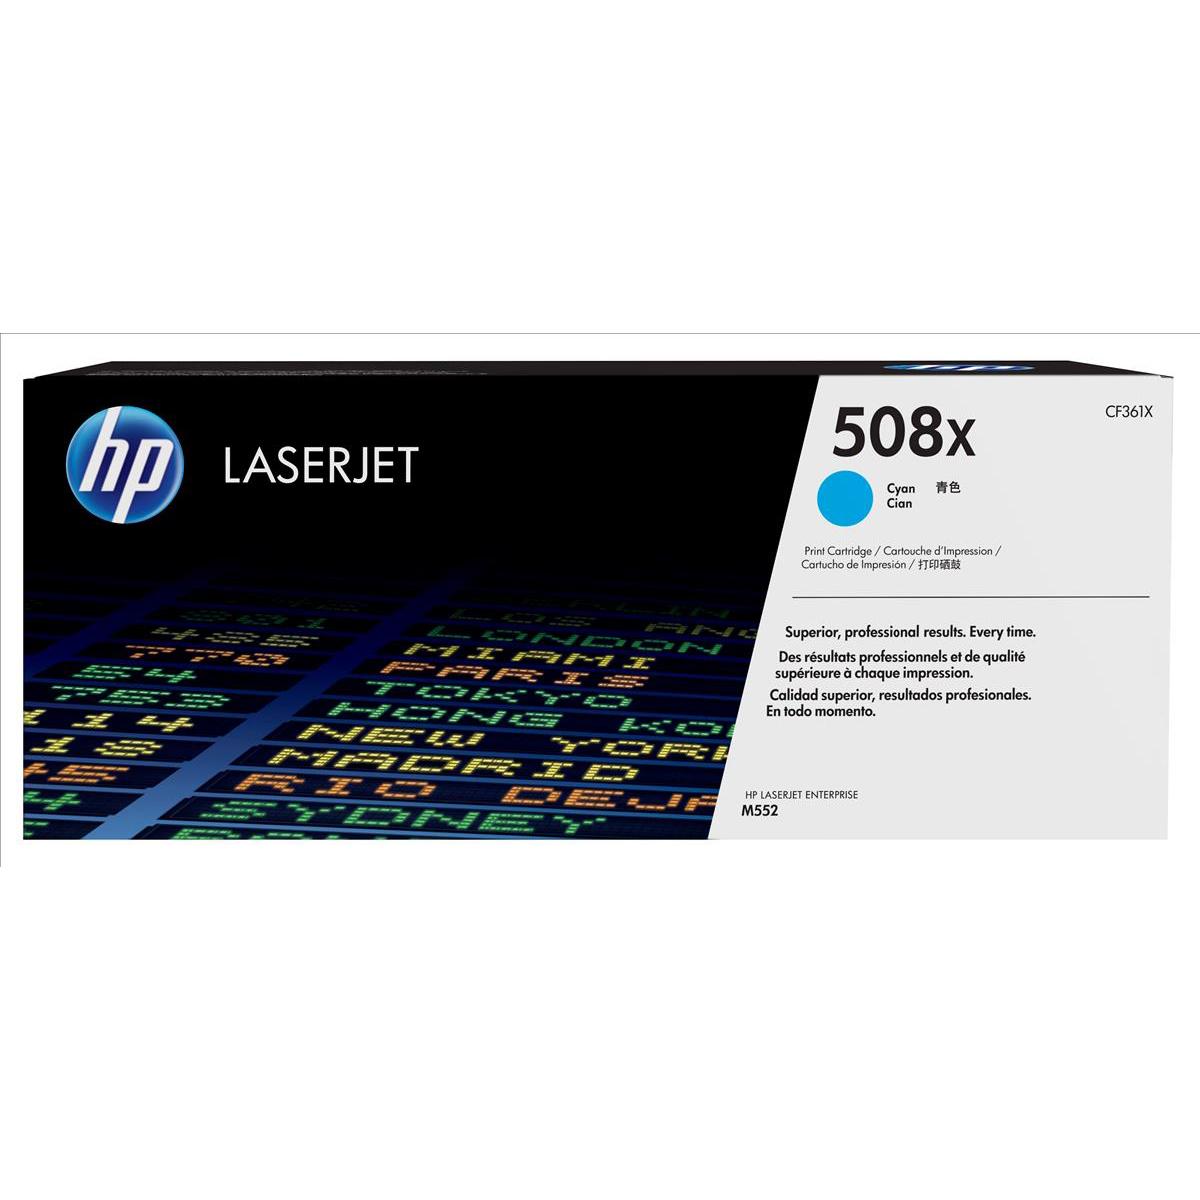 HP 508X Cyan High Yield Laserjet Toner Cartridge CF361X